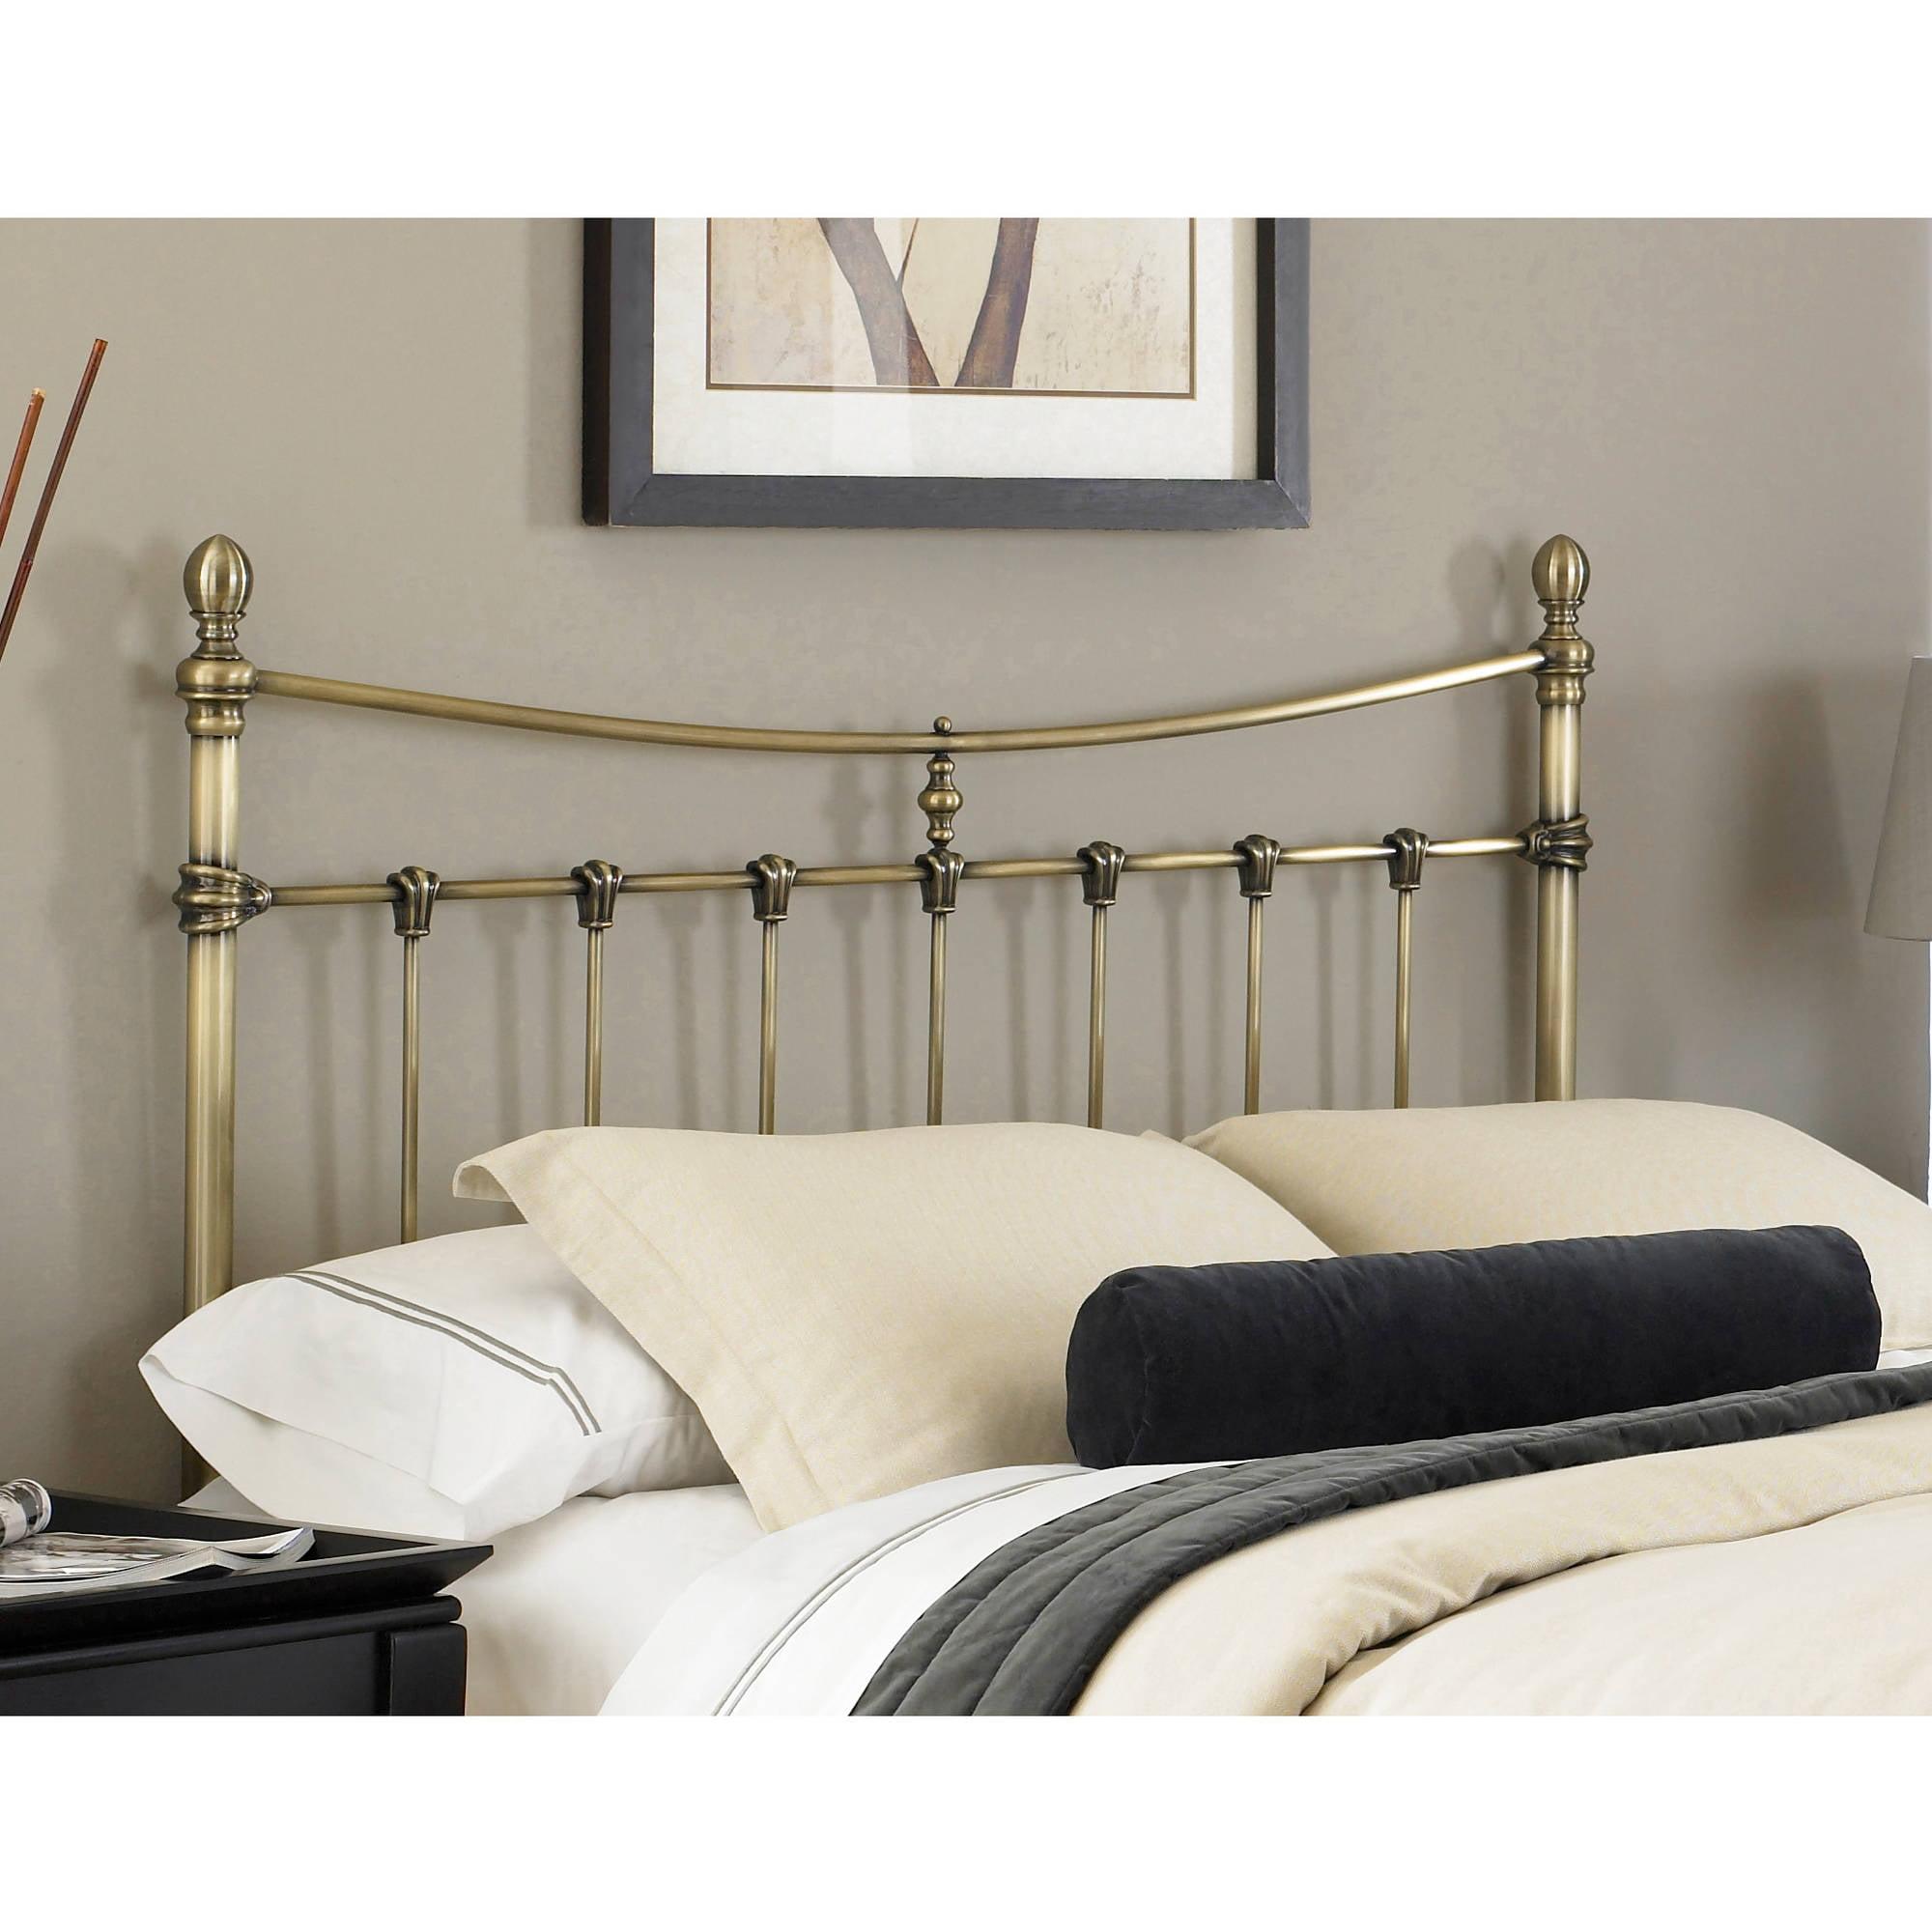 Fashion Bed Group by Leggett & Platt Leighton Antique Brass Headboard, Multiple Sizes